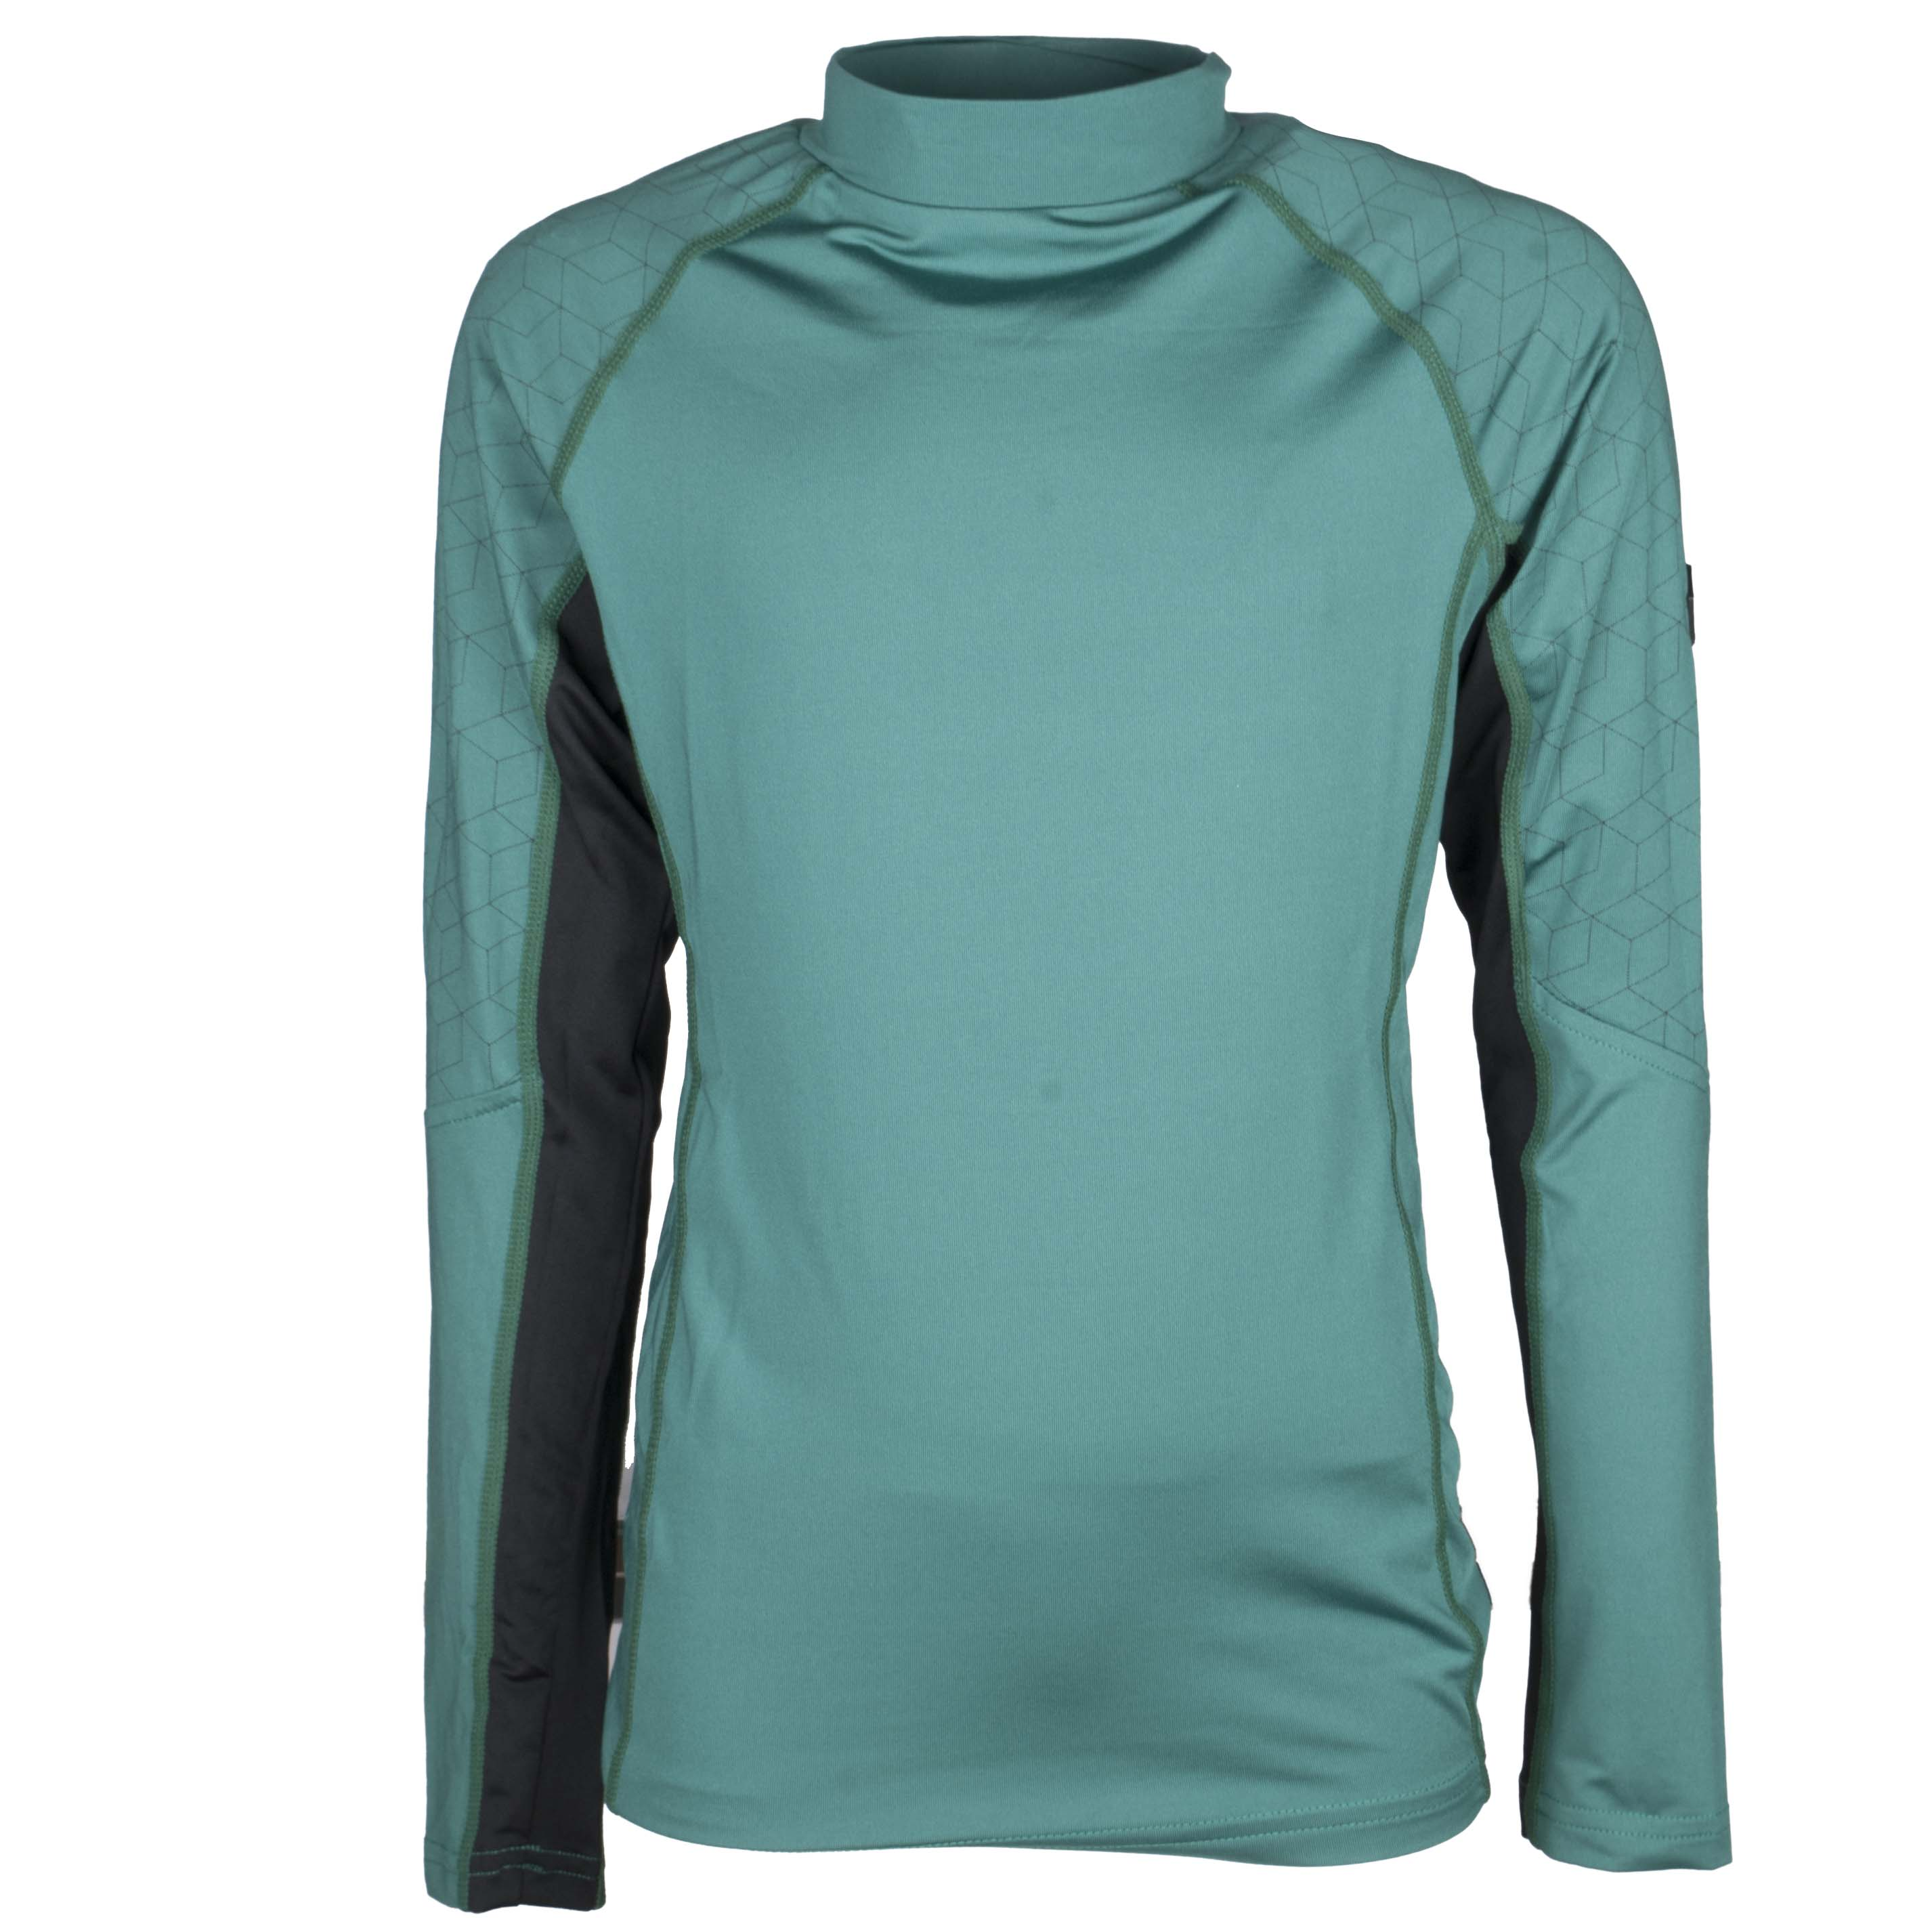 QHP QCross Eldorado kinder techshirt groen maat:140